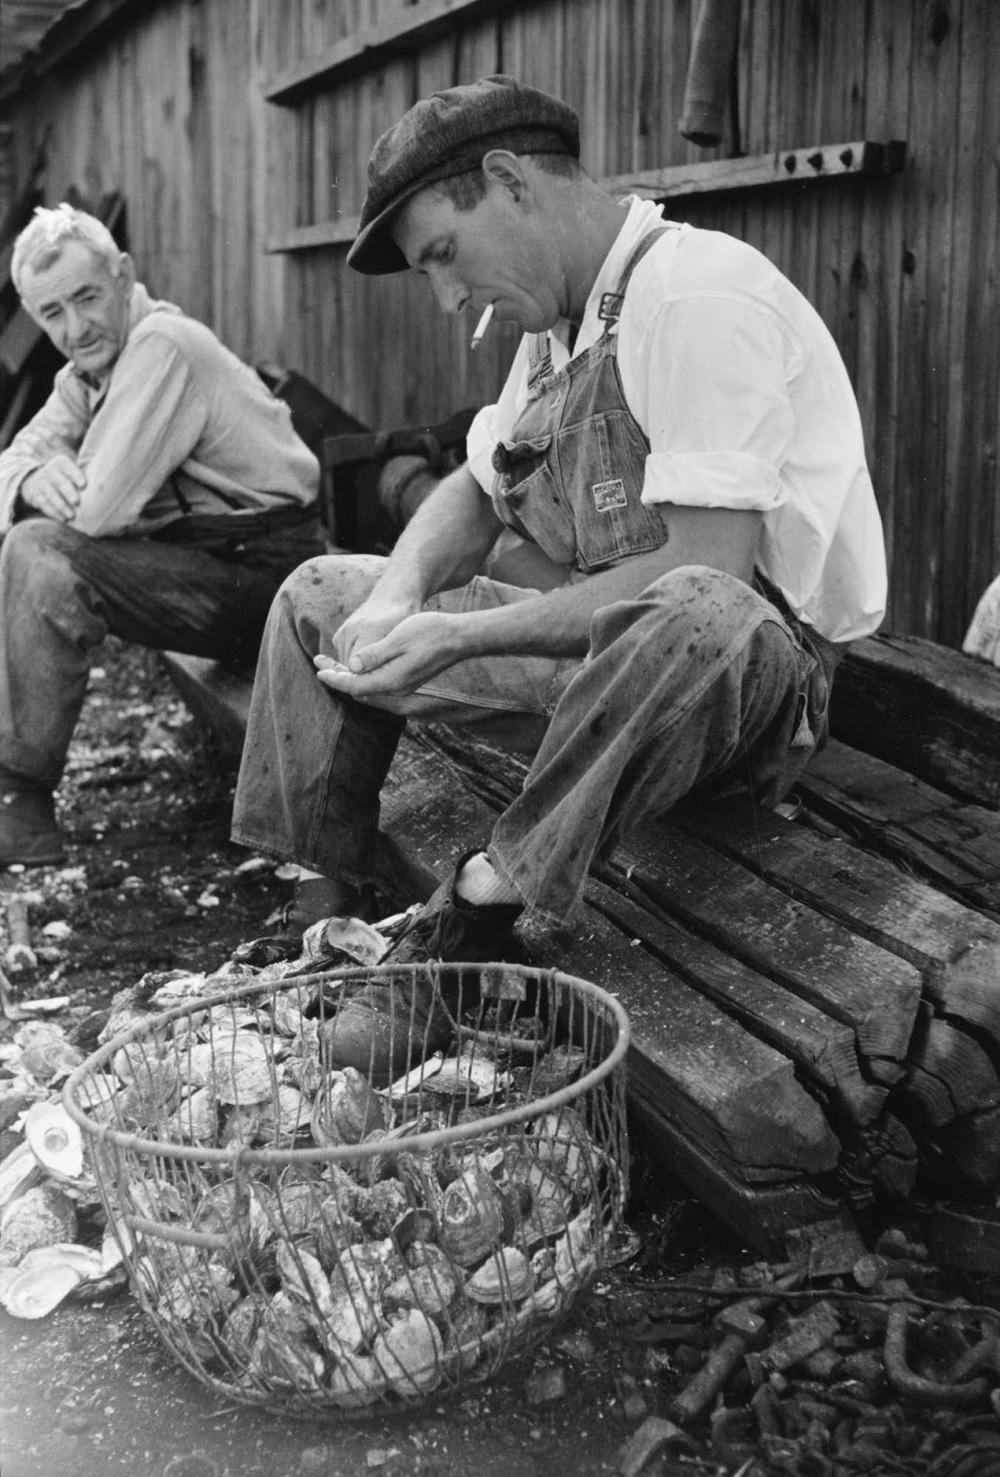 Arthur Rothstein - Shucking oysters, Bivalve, New Jersey, 1938.jpg